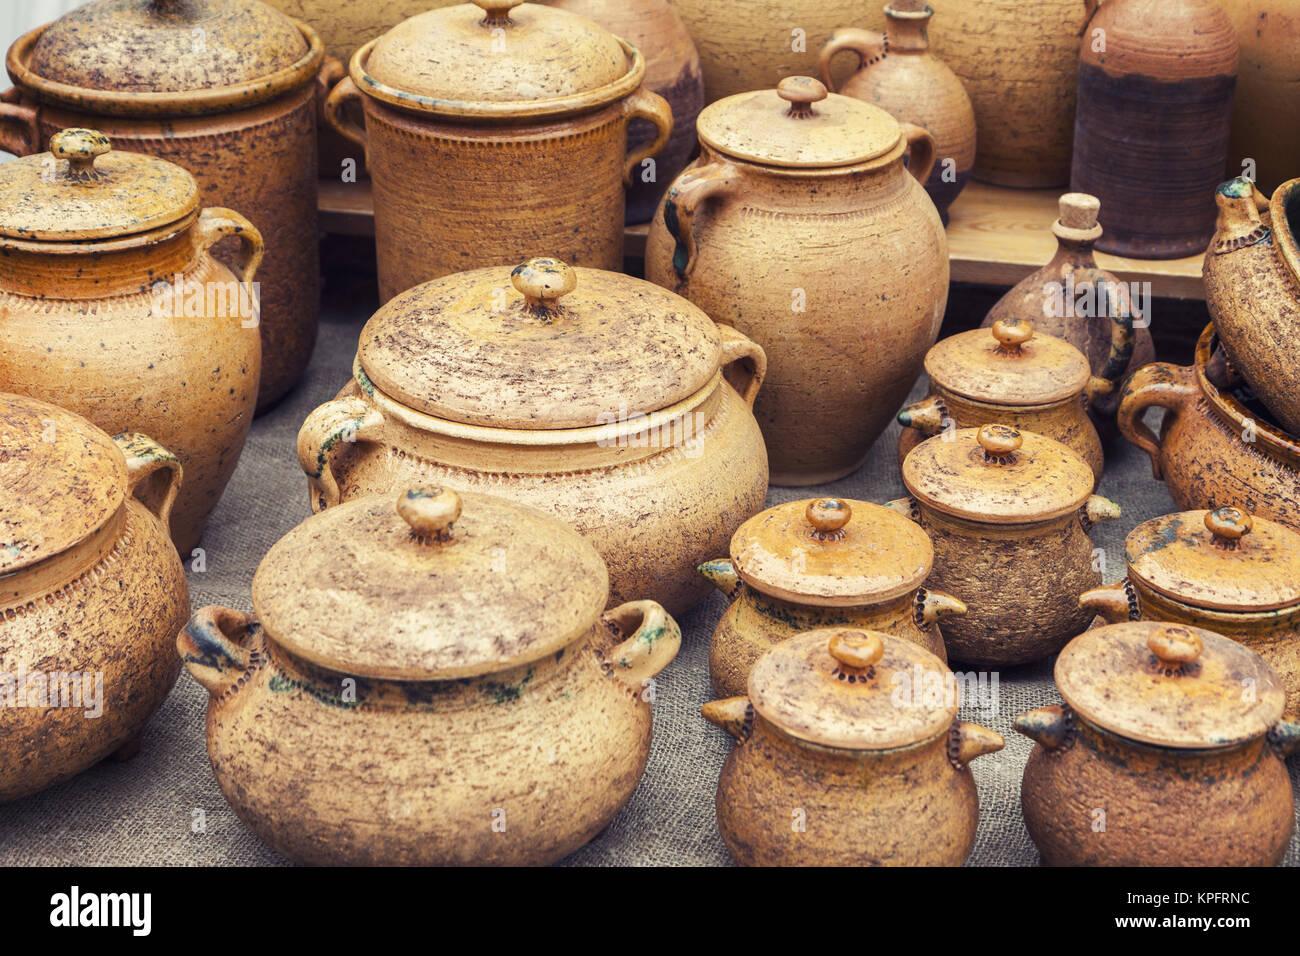 Traditional handmade pottery - Stock Image